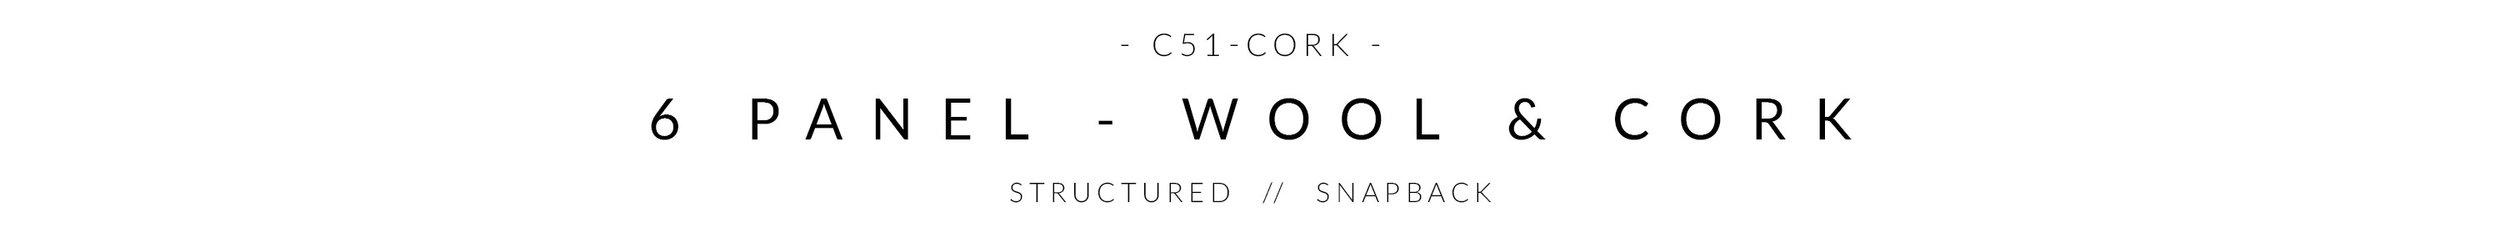 C51-CORK HEADER.jpg